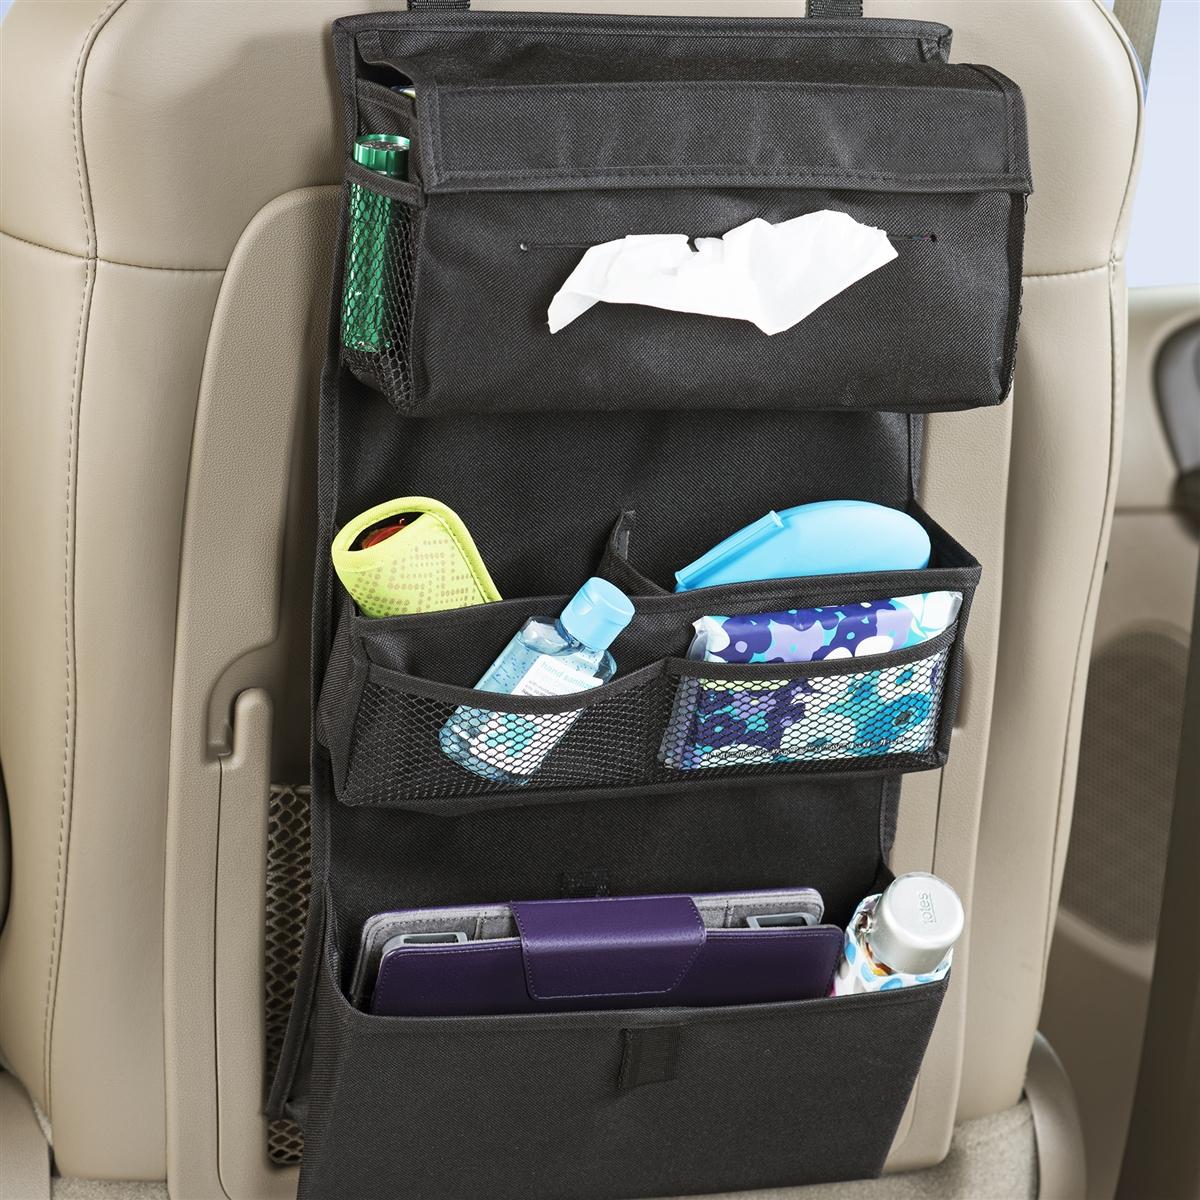 High Road Car Organizers - Hanging Seat Back Tissue Organizer